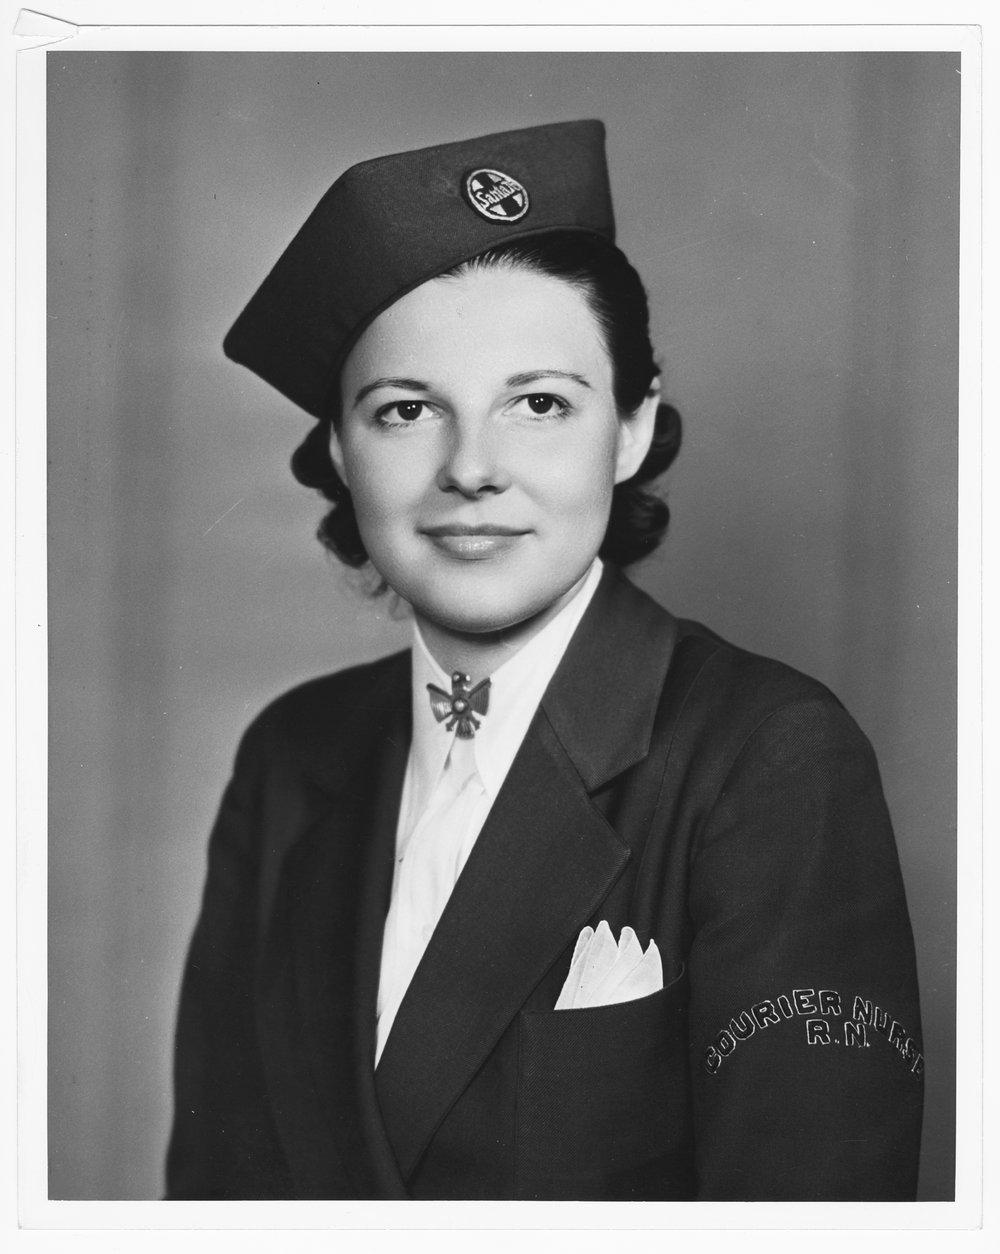 Santa Fe Courier Nurse, Marcella Shatusky - 1